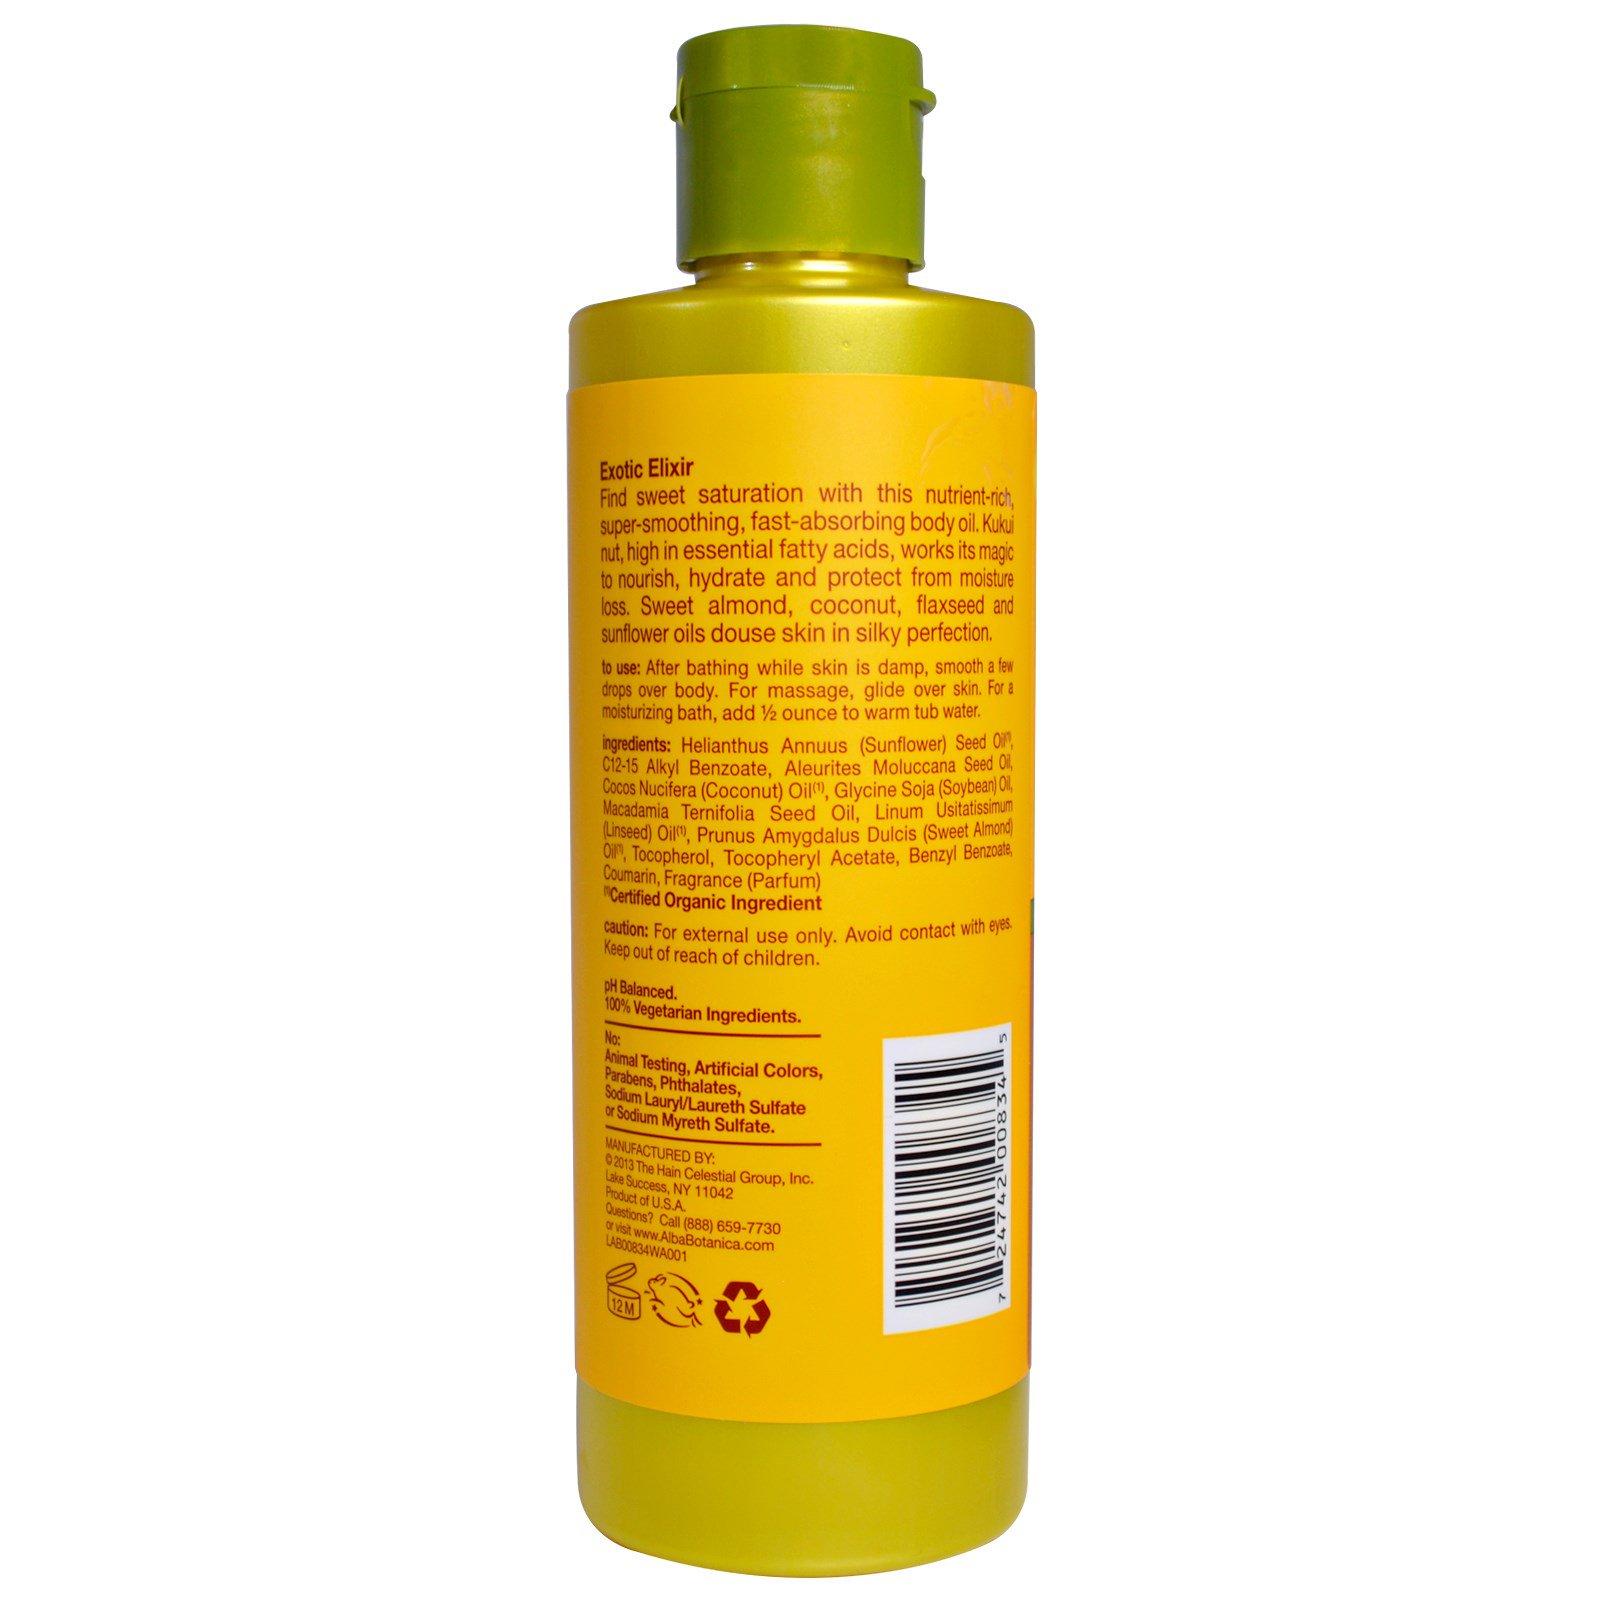 Alba Botanica, Hawaiian Body Oil, Kukui Nut, 8 5 fl oz (251 ml)